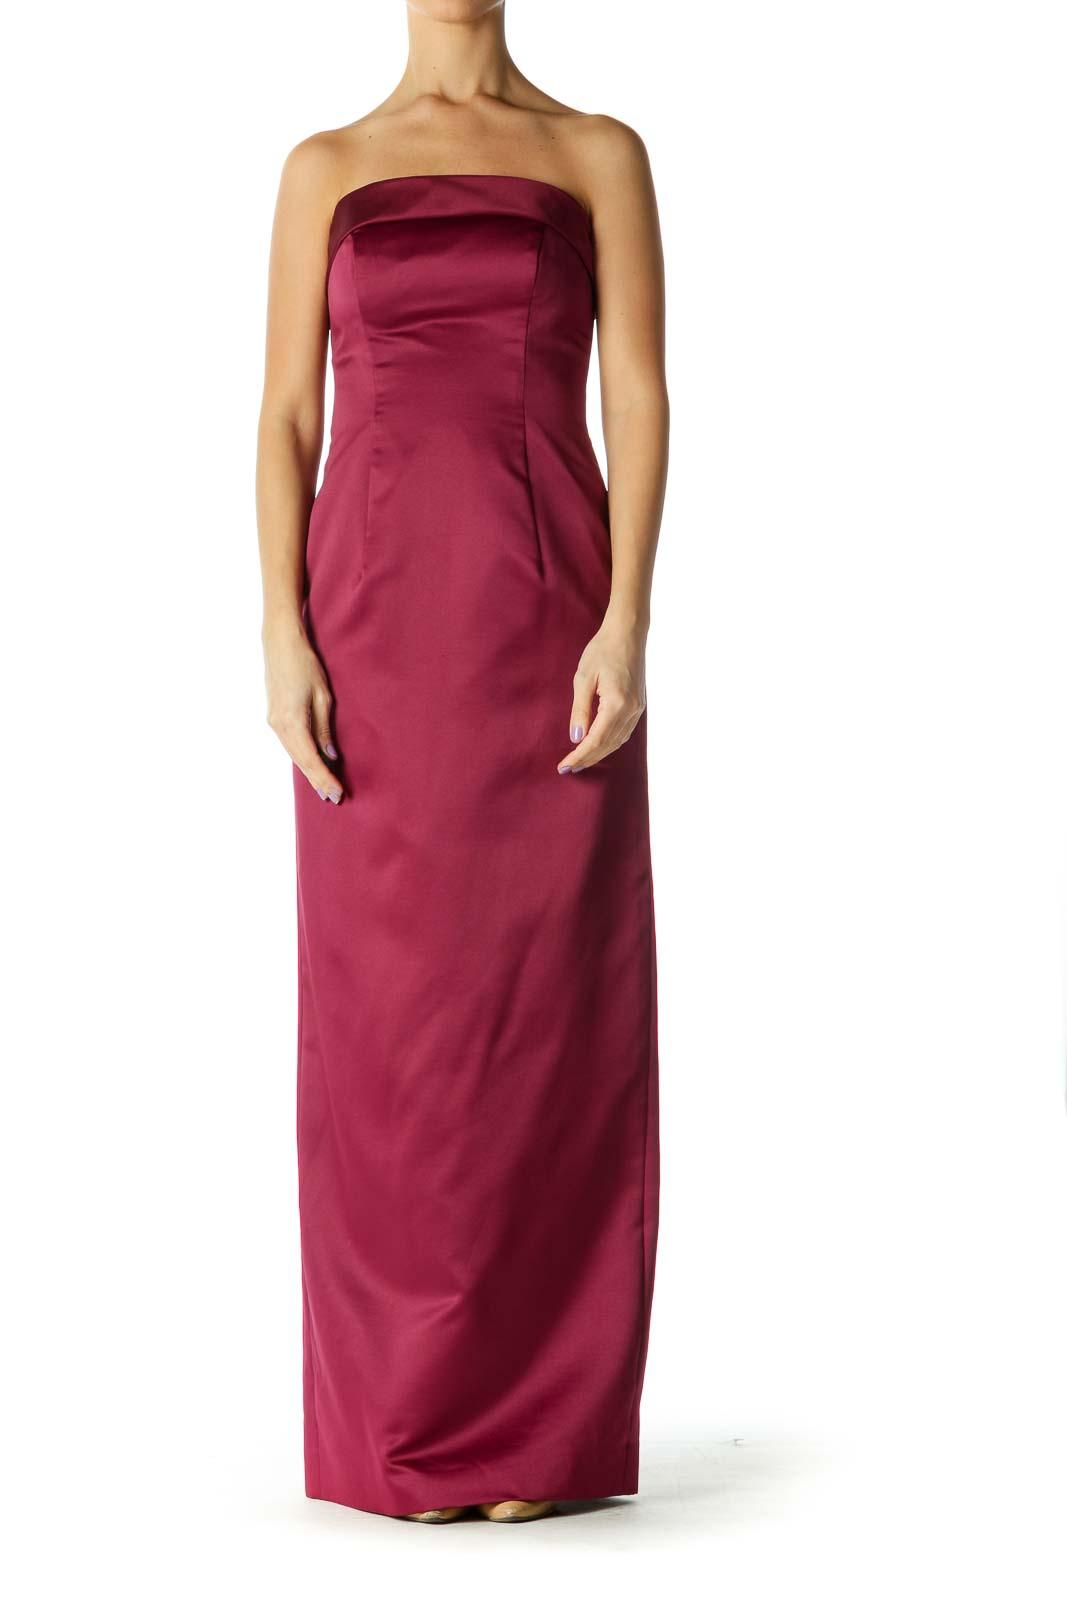 Burgundy Strapless Dress Front